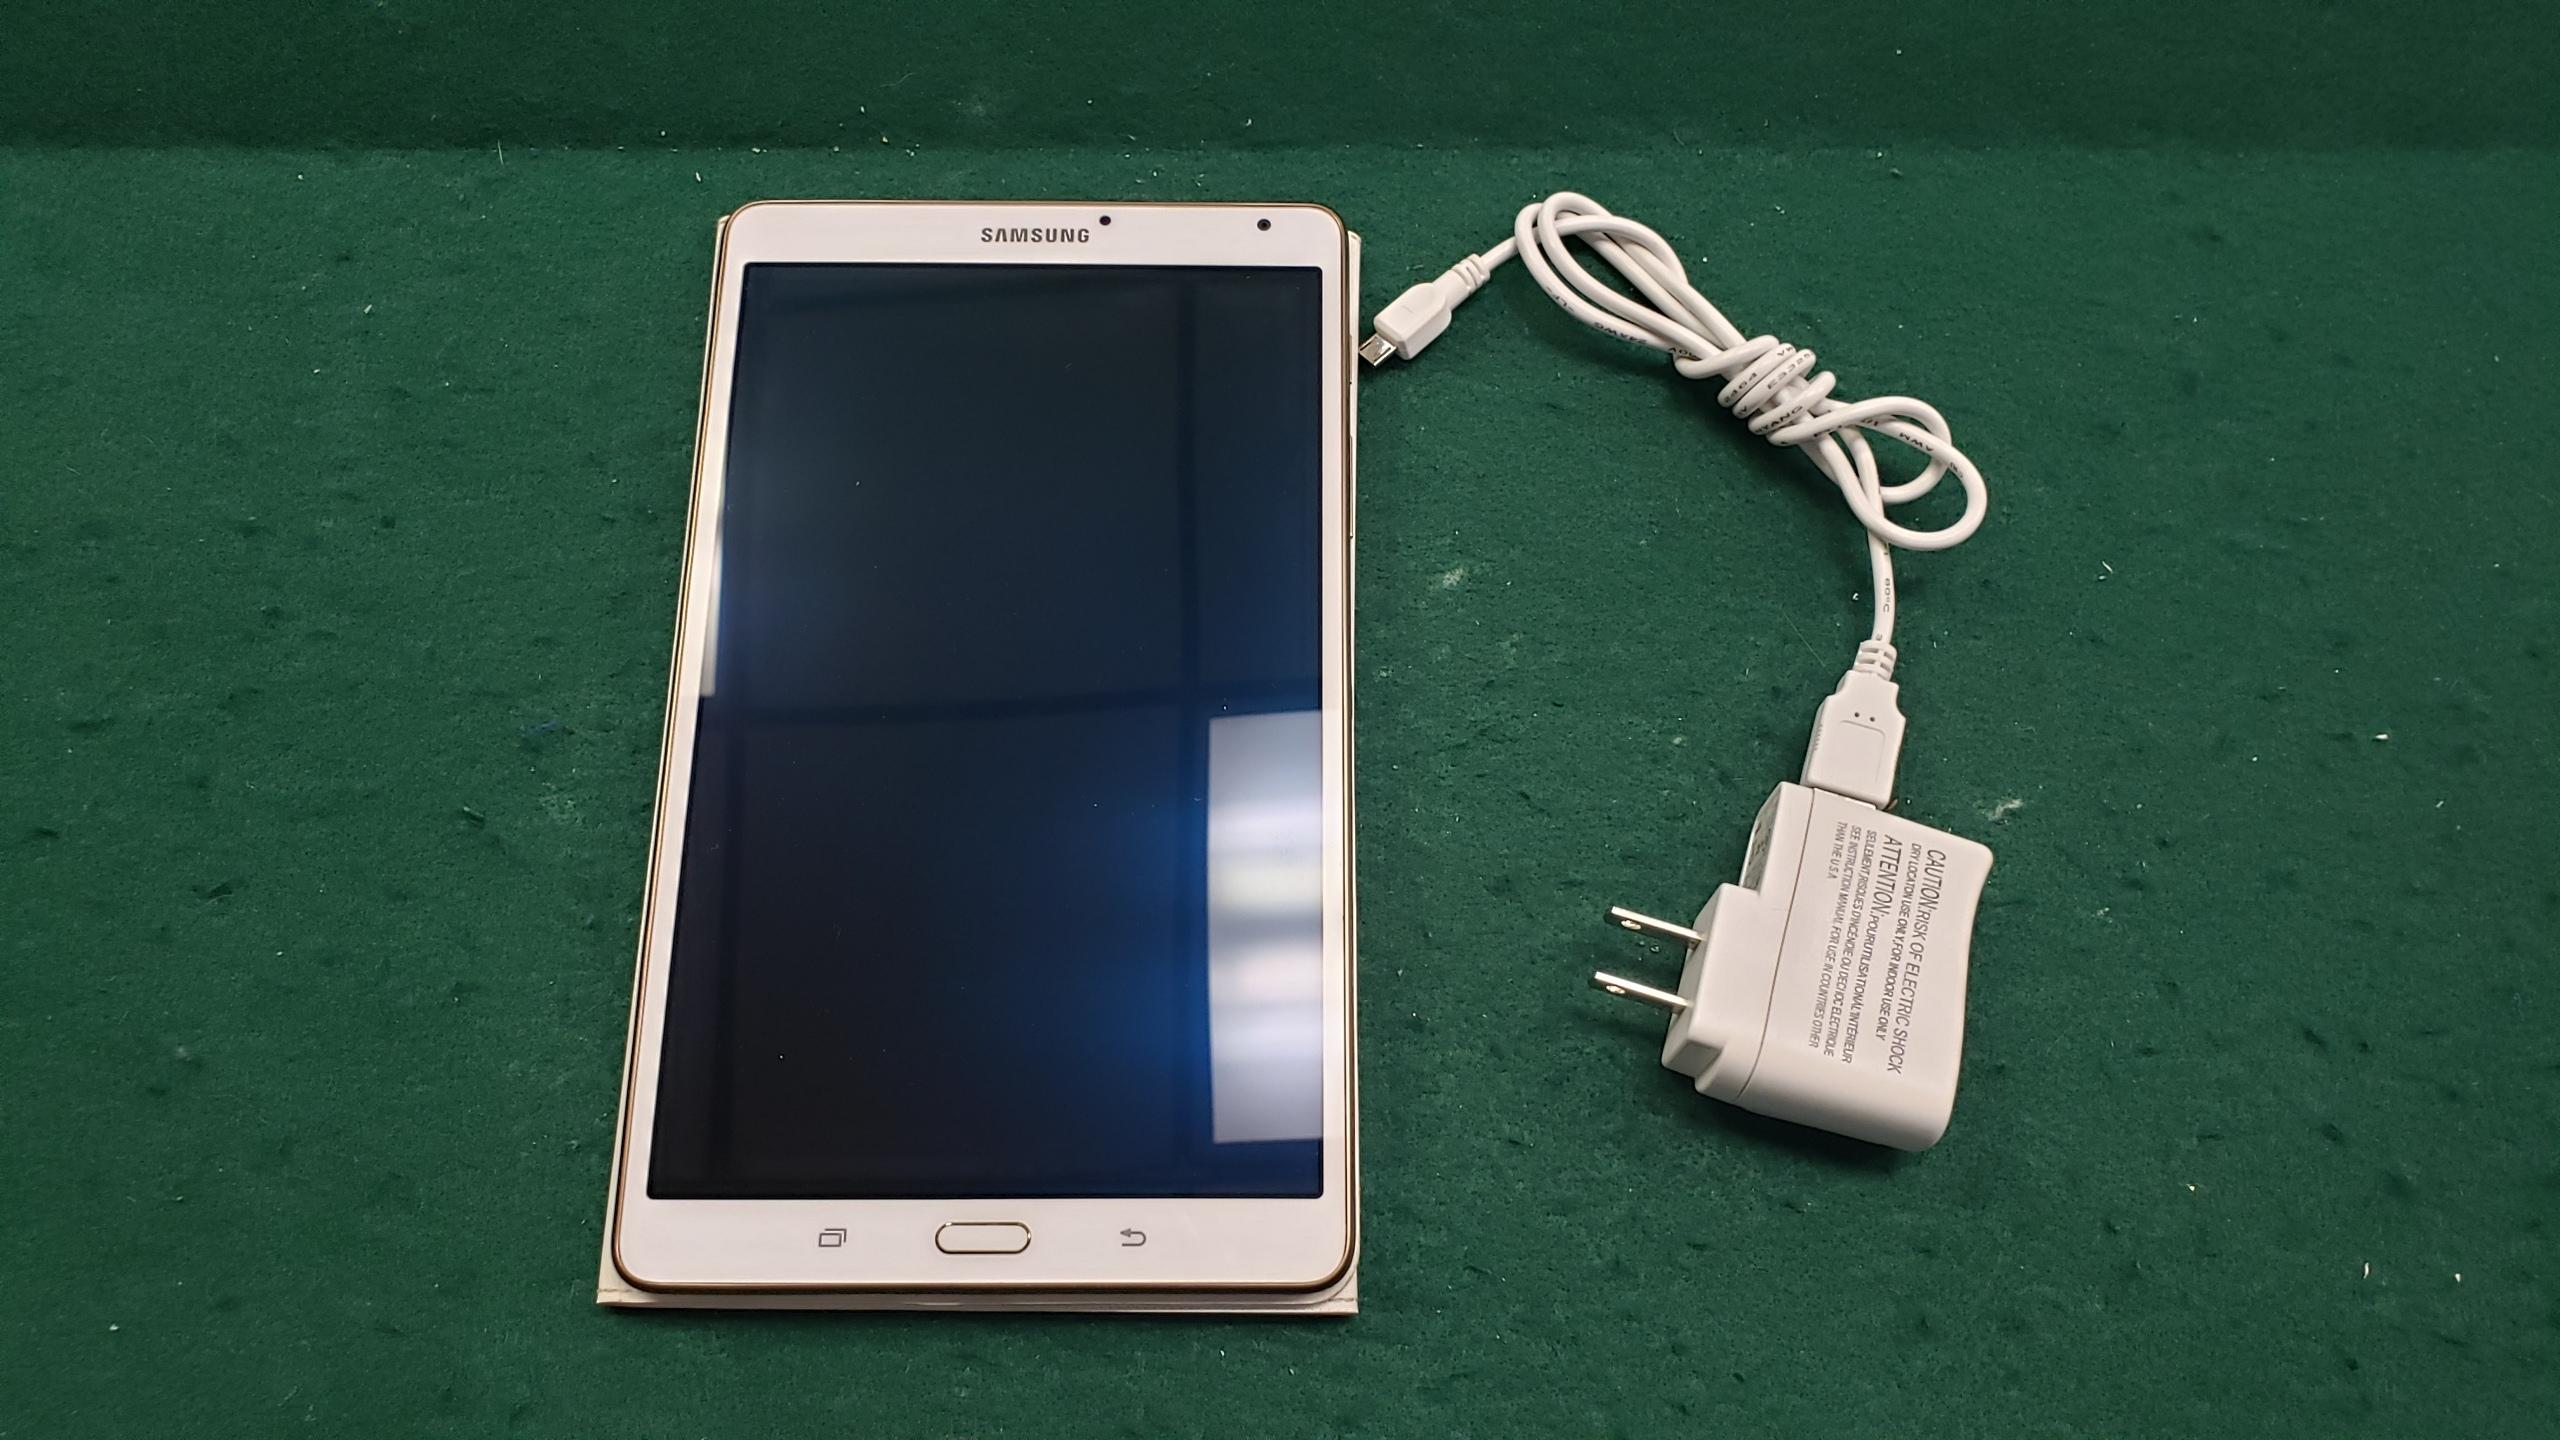 SAMSUNG - SMT-1700 - GALAXY TAB S - TABLET